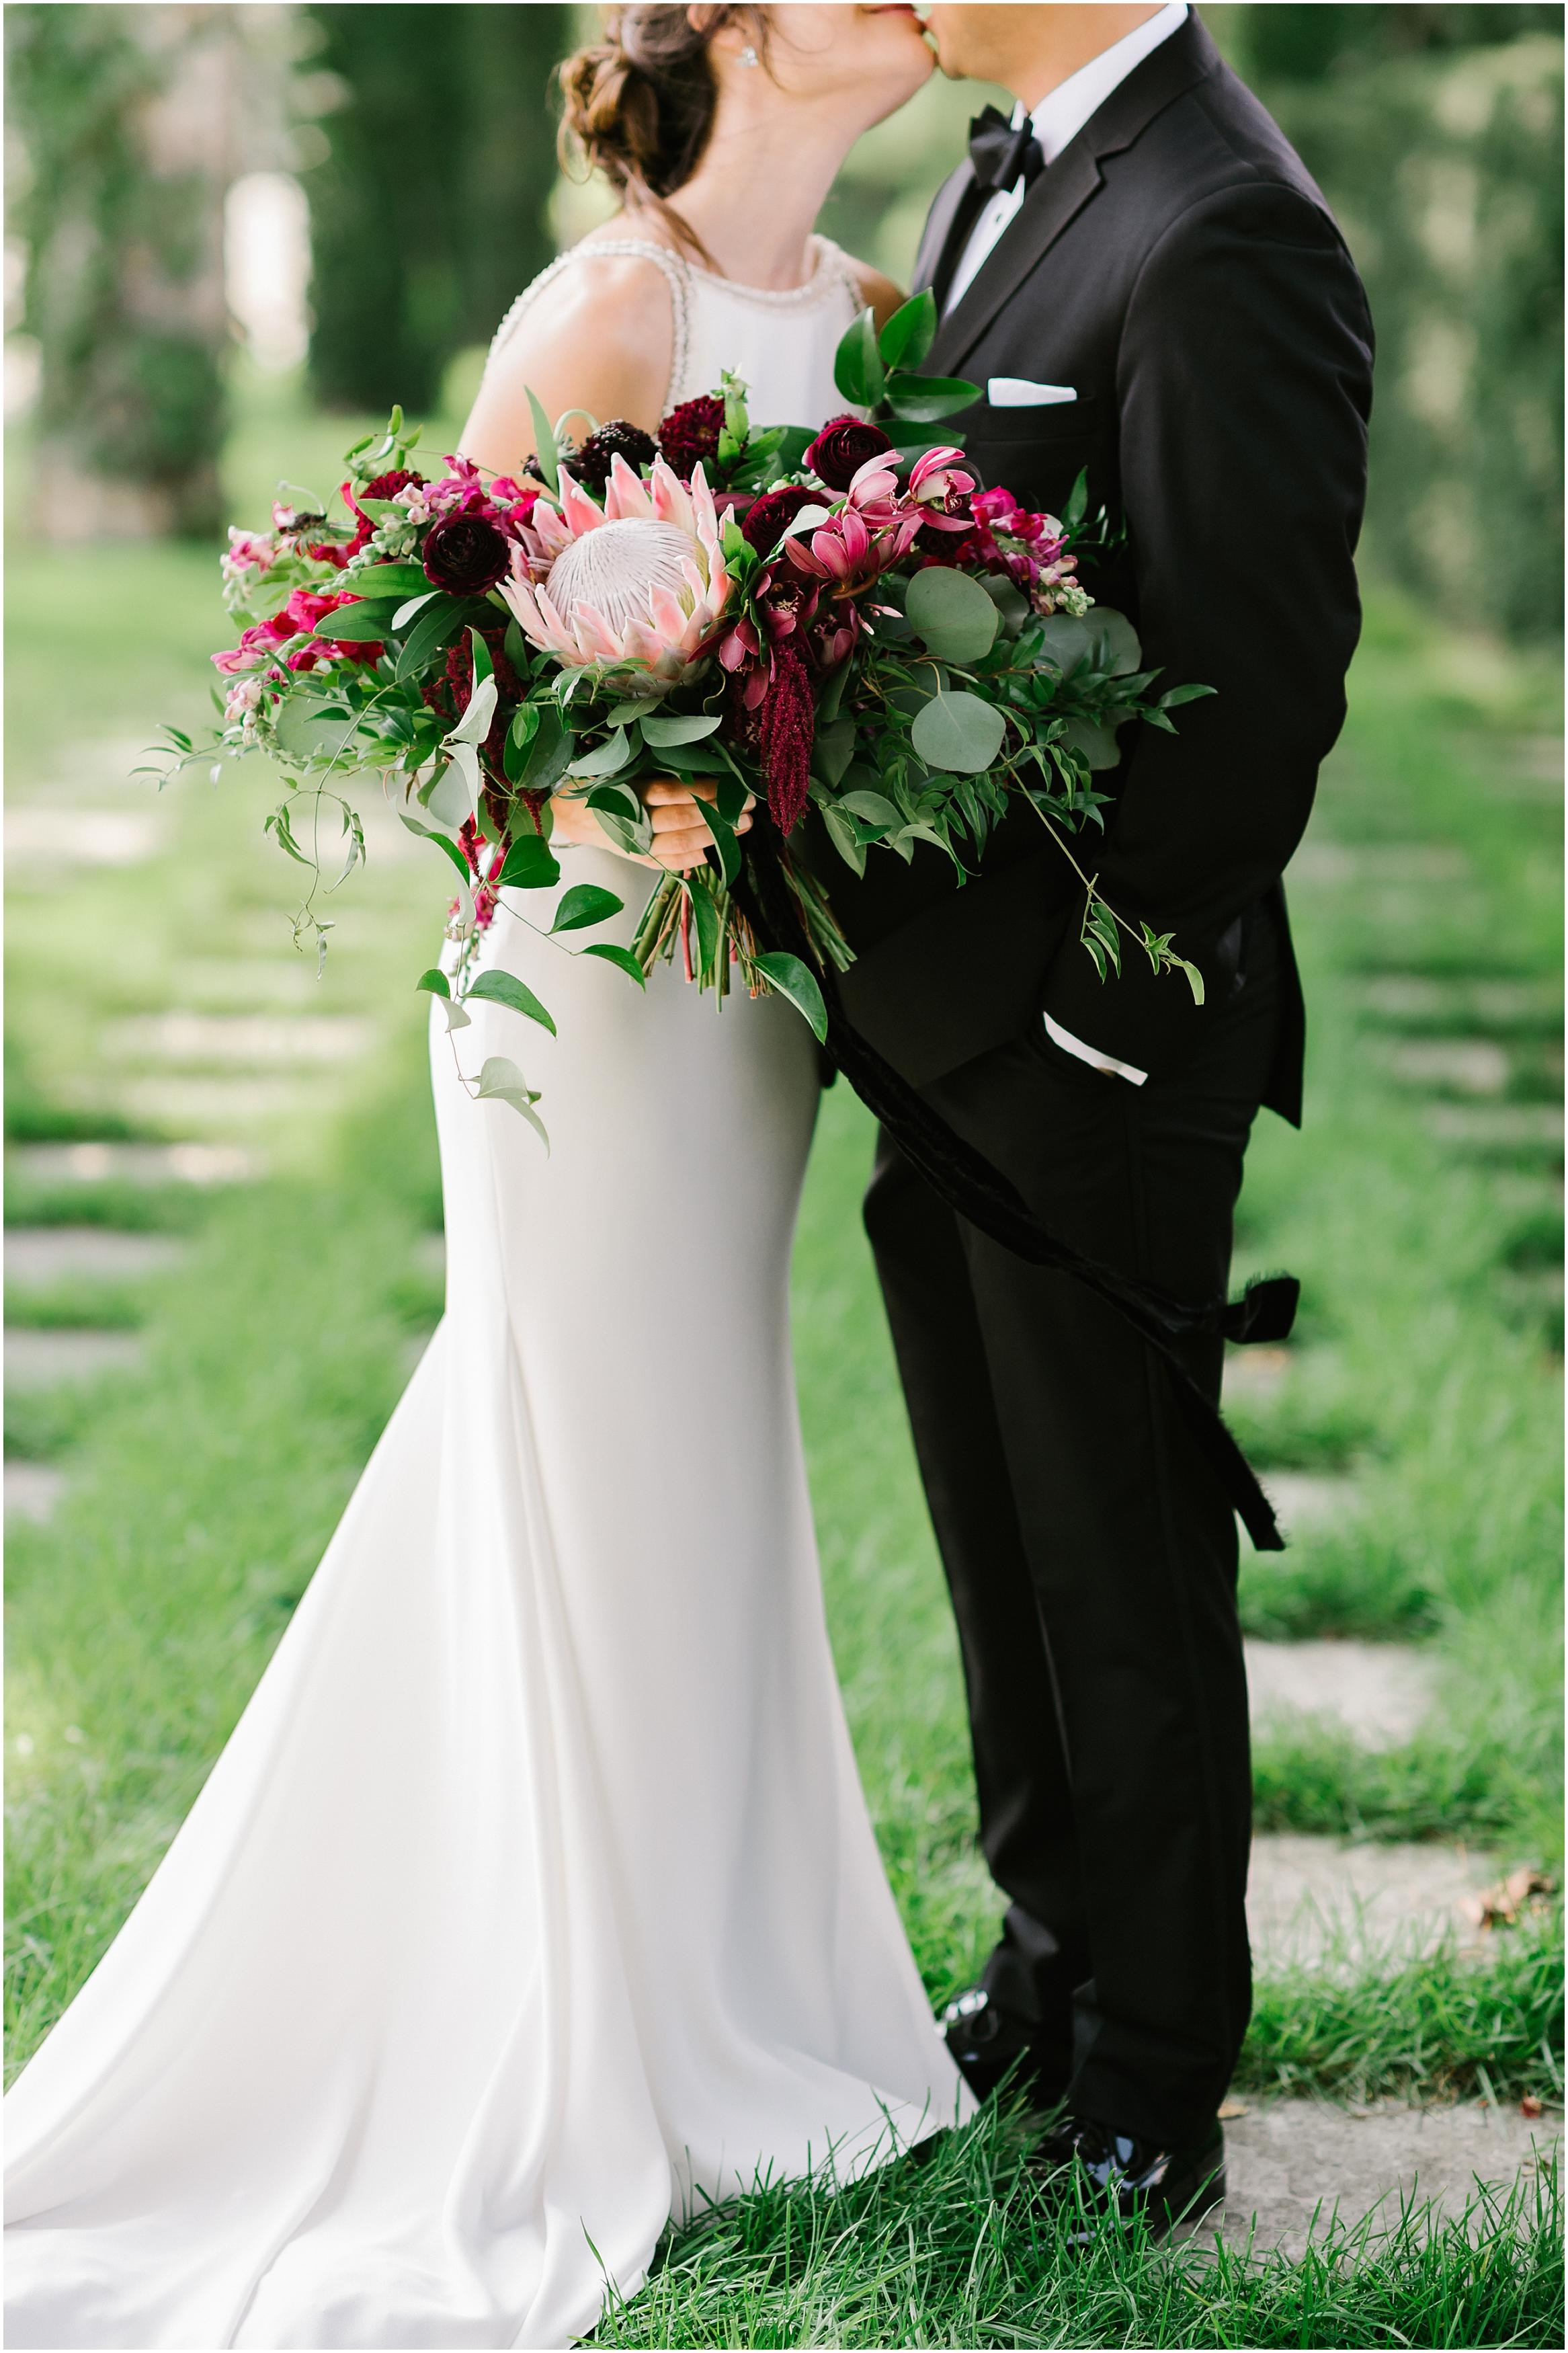 Rebecca_Shehorn_Photography_Indianapolis Wedding Photographer Sycamore at Mallow Run Wedding_9744.jpg